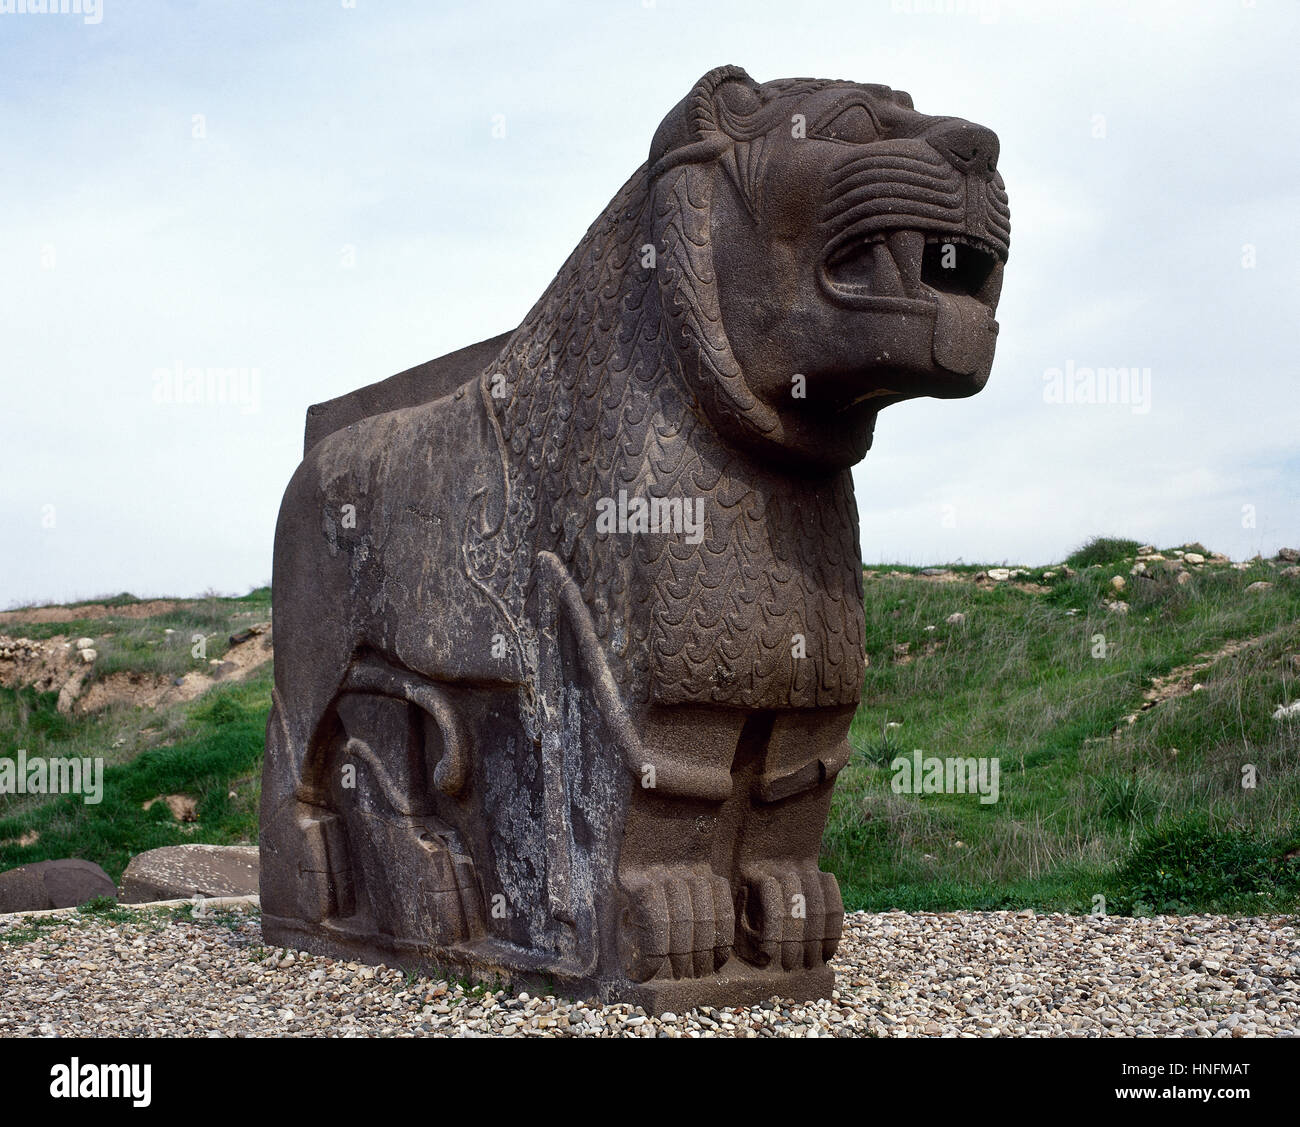 Colossal basalt lion. Ain Dara. Archaeological site. Syro-Hittite. Iron Age. 1300-740 BC. - Stock Image